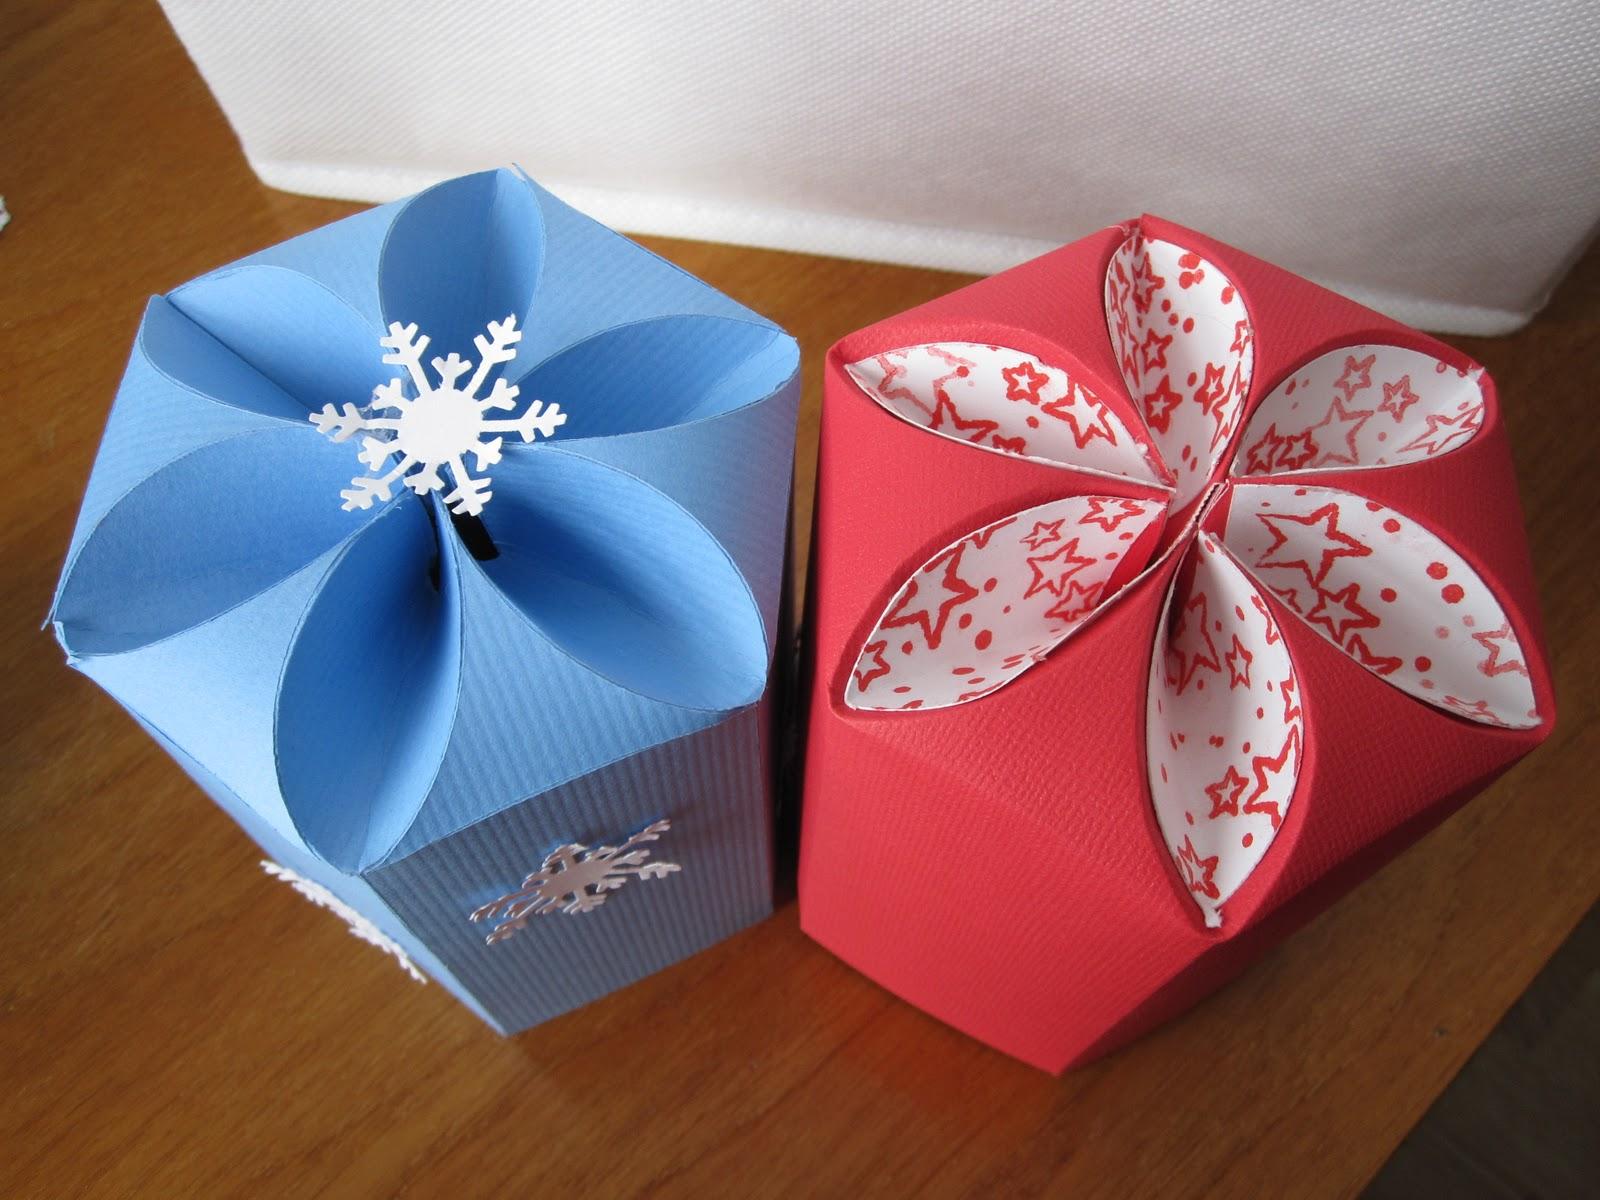 Paperpastime Petal Top Box Glitter Ornaments Fit